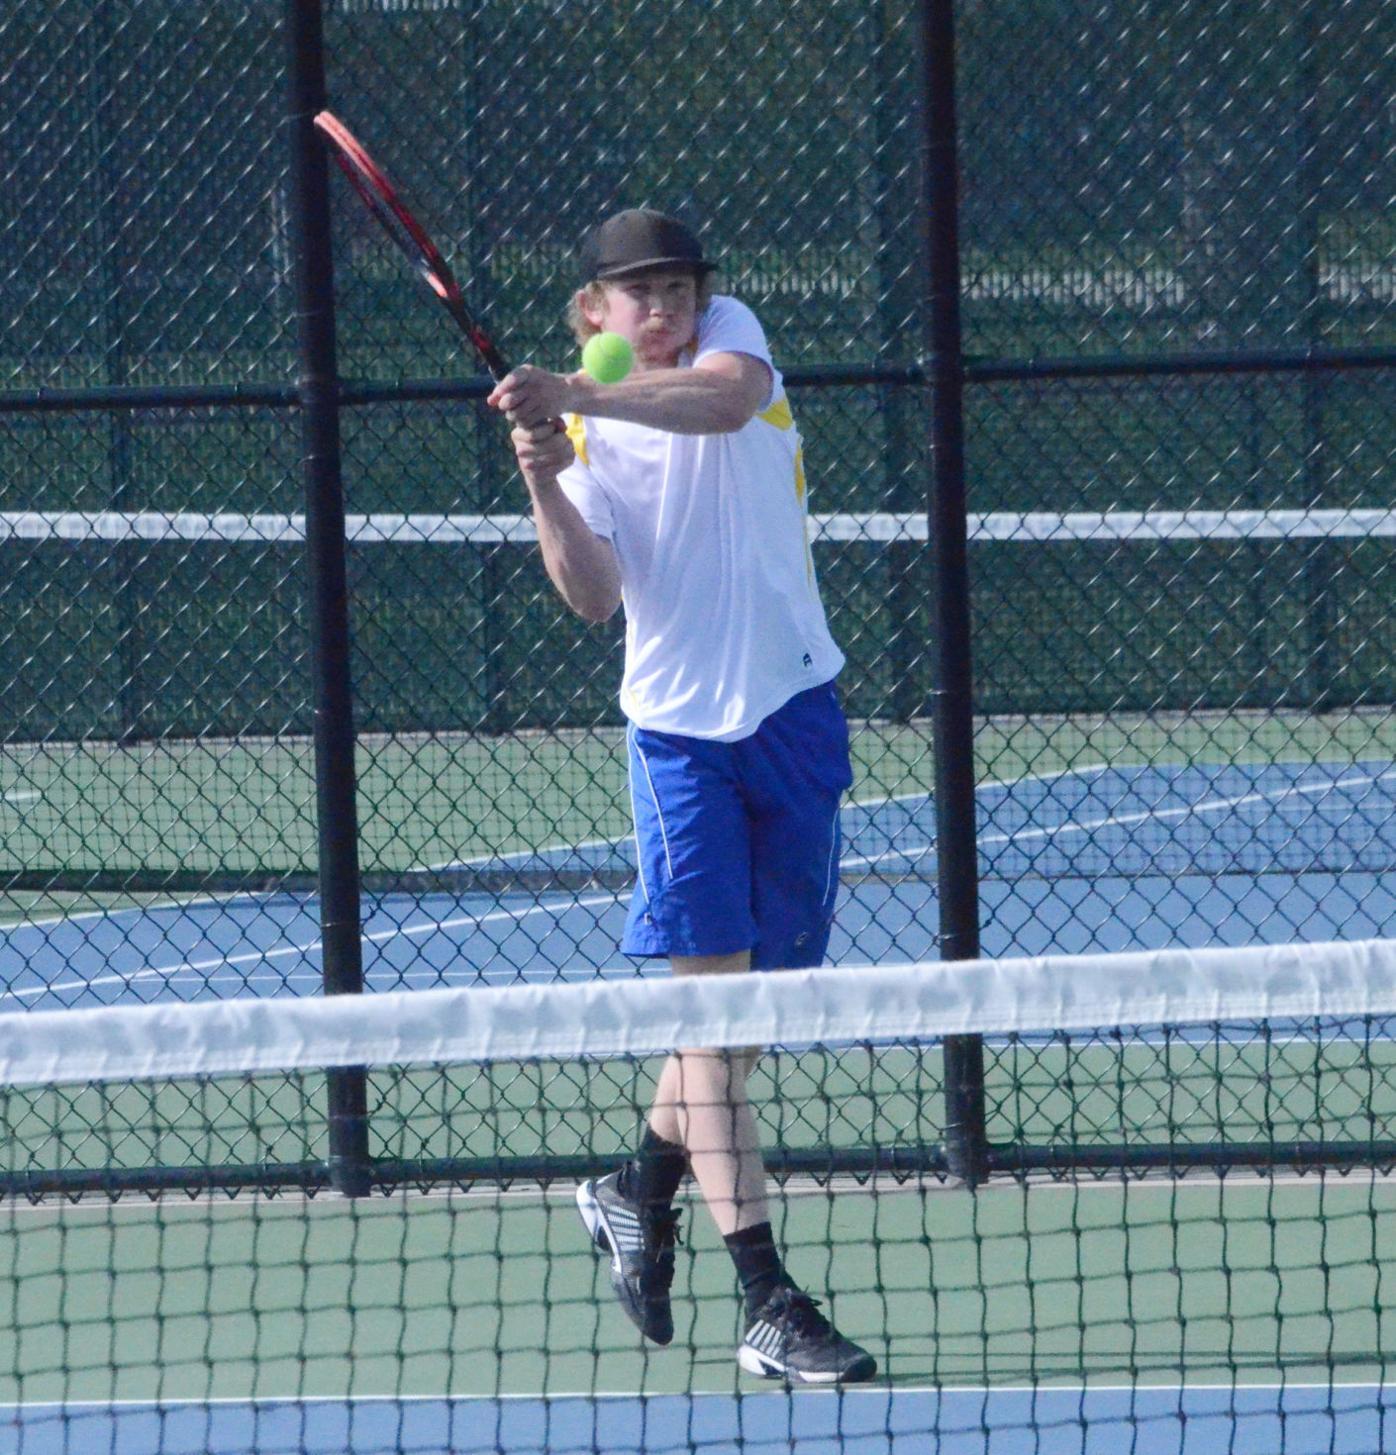 Waseca tennis begins season 3-8, Huttemier ranked in top 5 in Class A